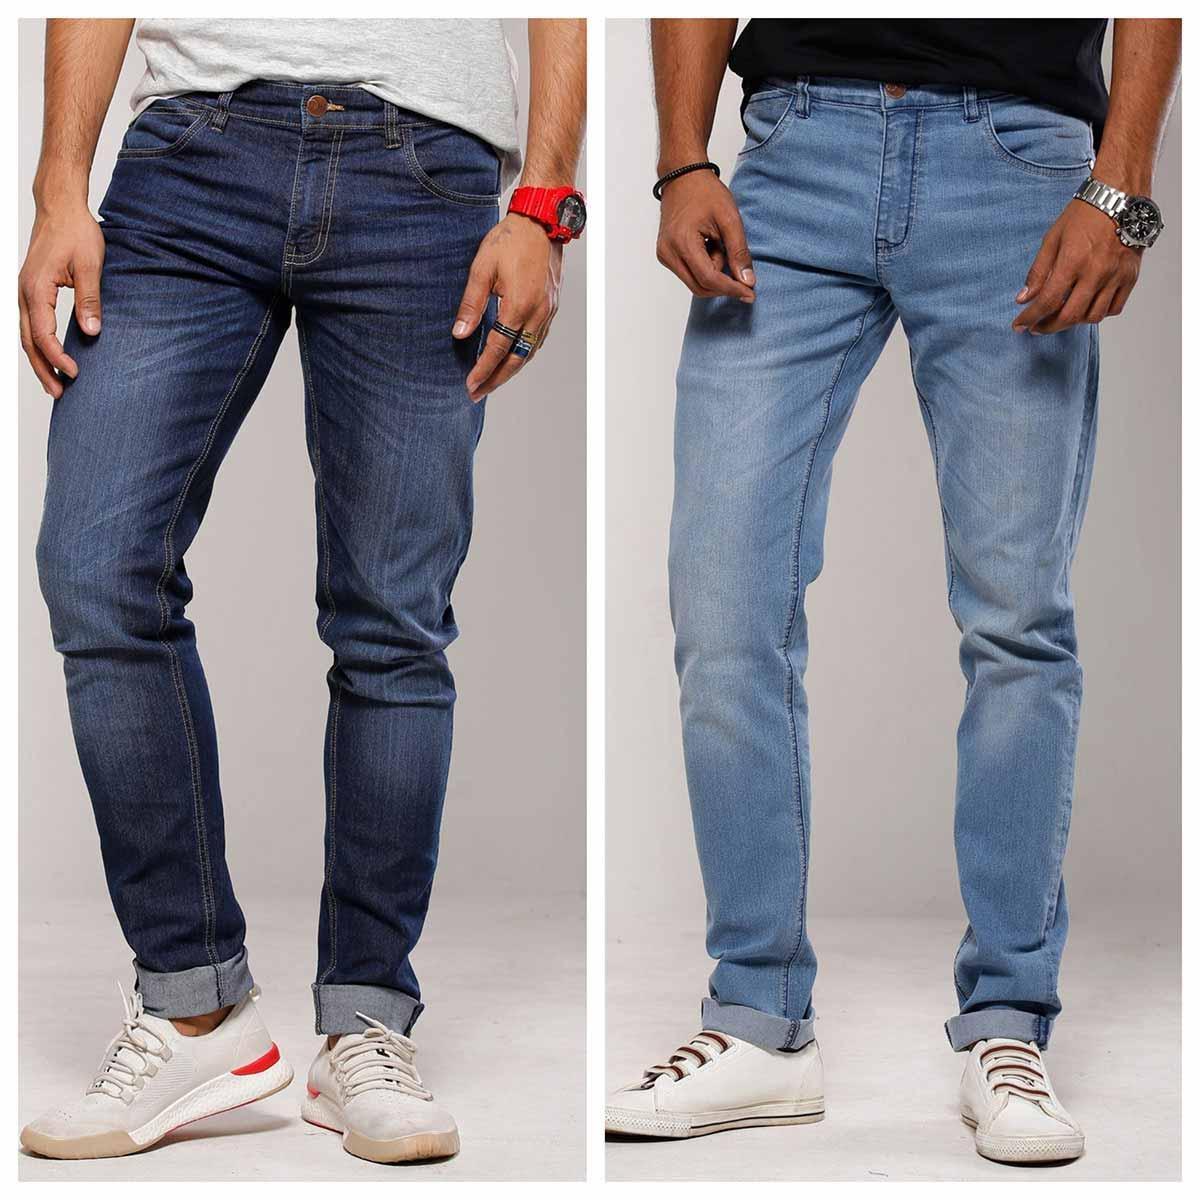 bb30fd78 Men's Regular Fit Jeans In Bangladesh At Best Price - Daraz.com.bd